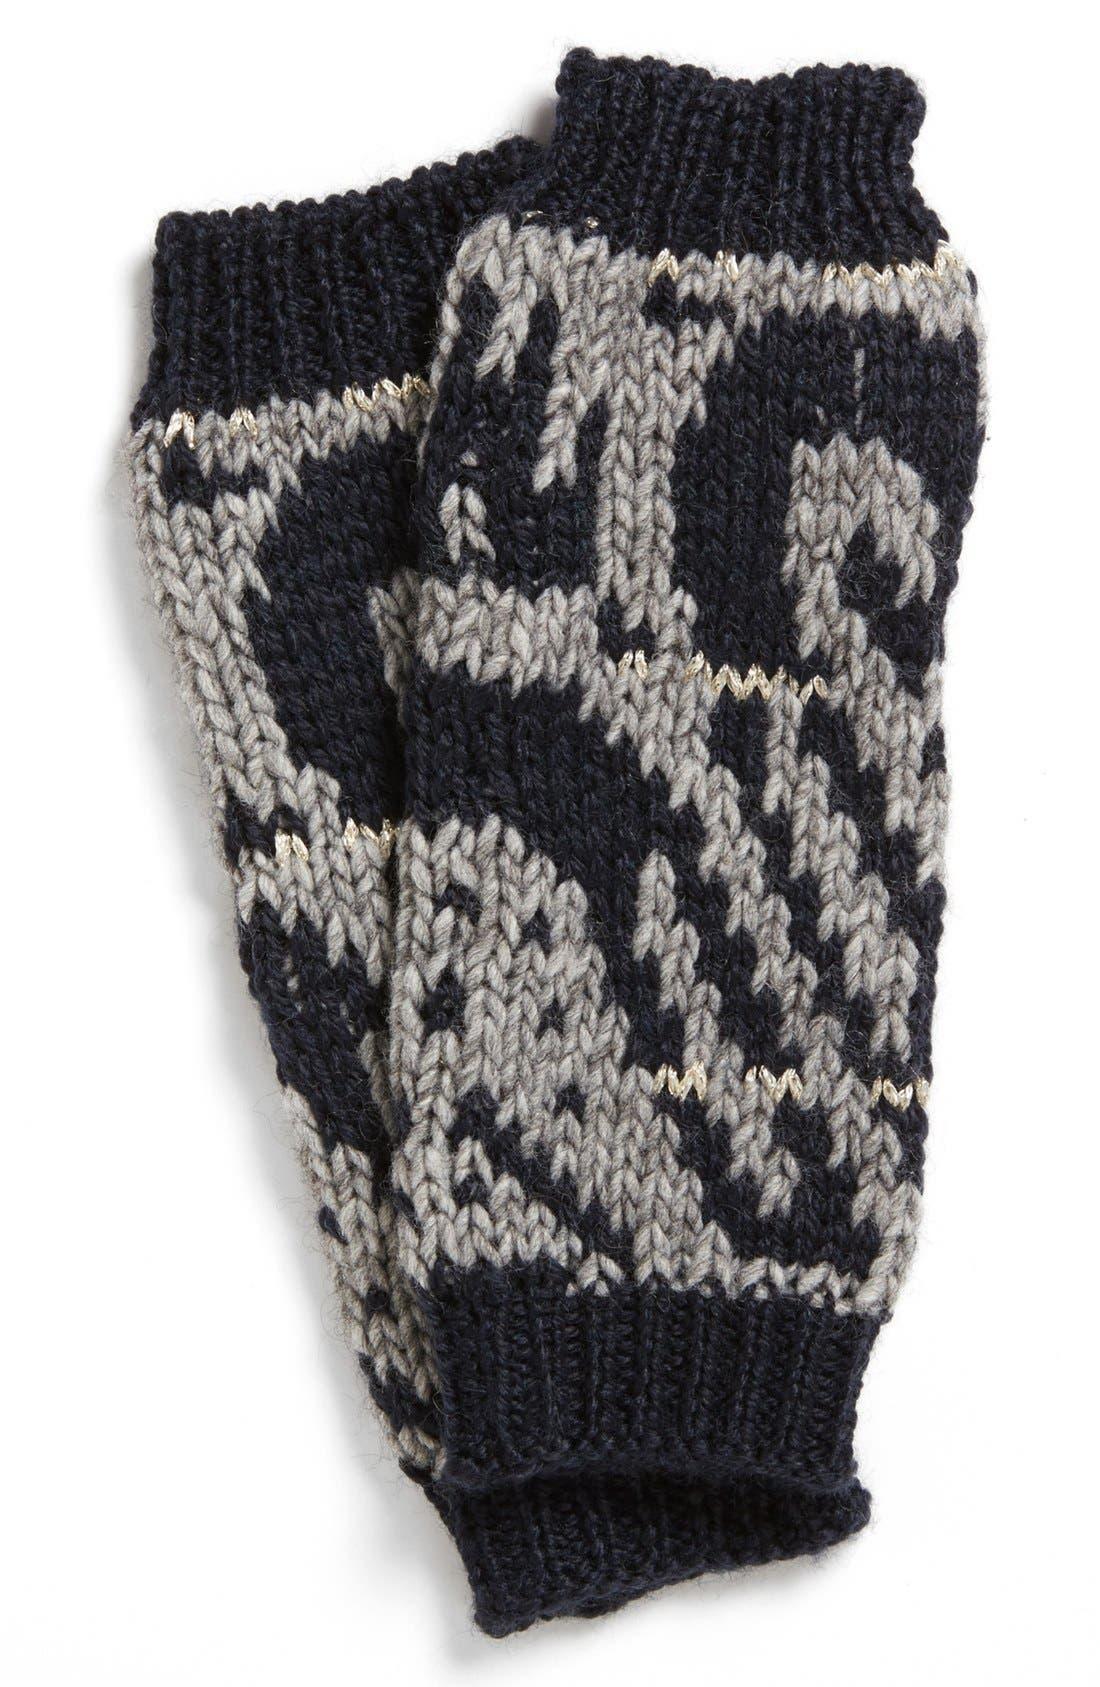 Main Image - Nordstrom 'Brocade' Intarsia Knit Fingerless Gloves